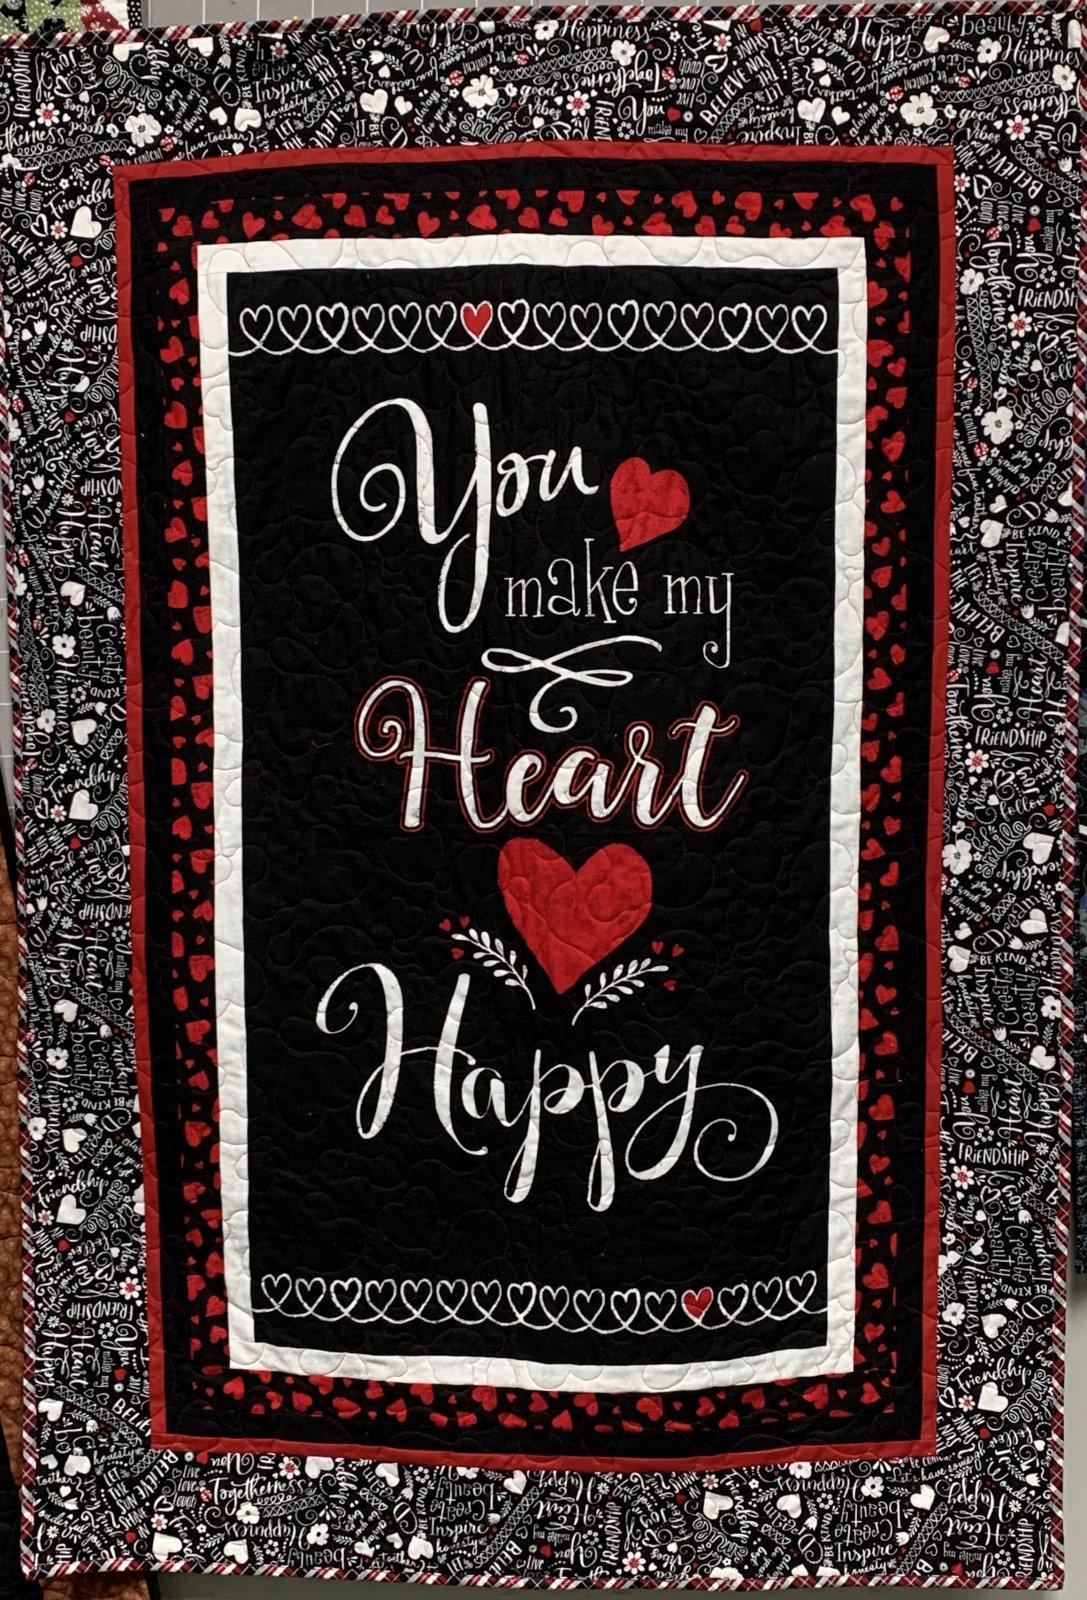 You Make My Heart Happy- Kit 2020